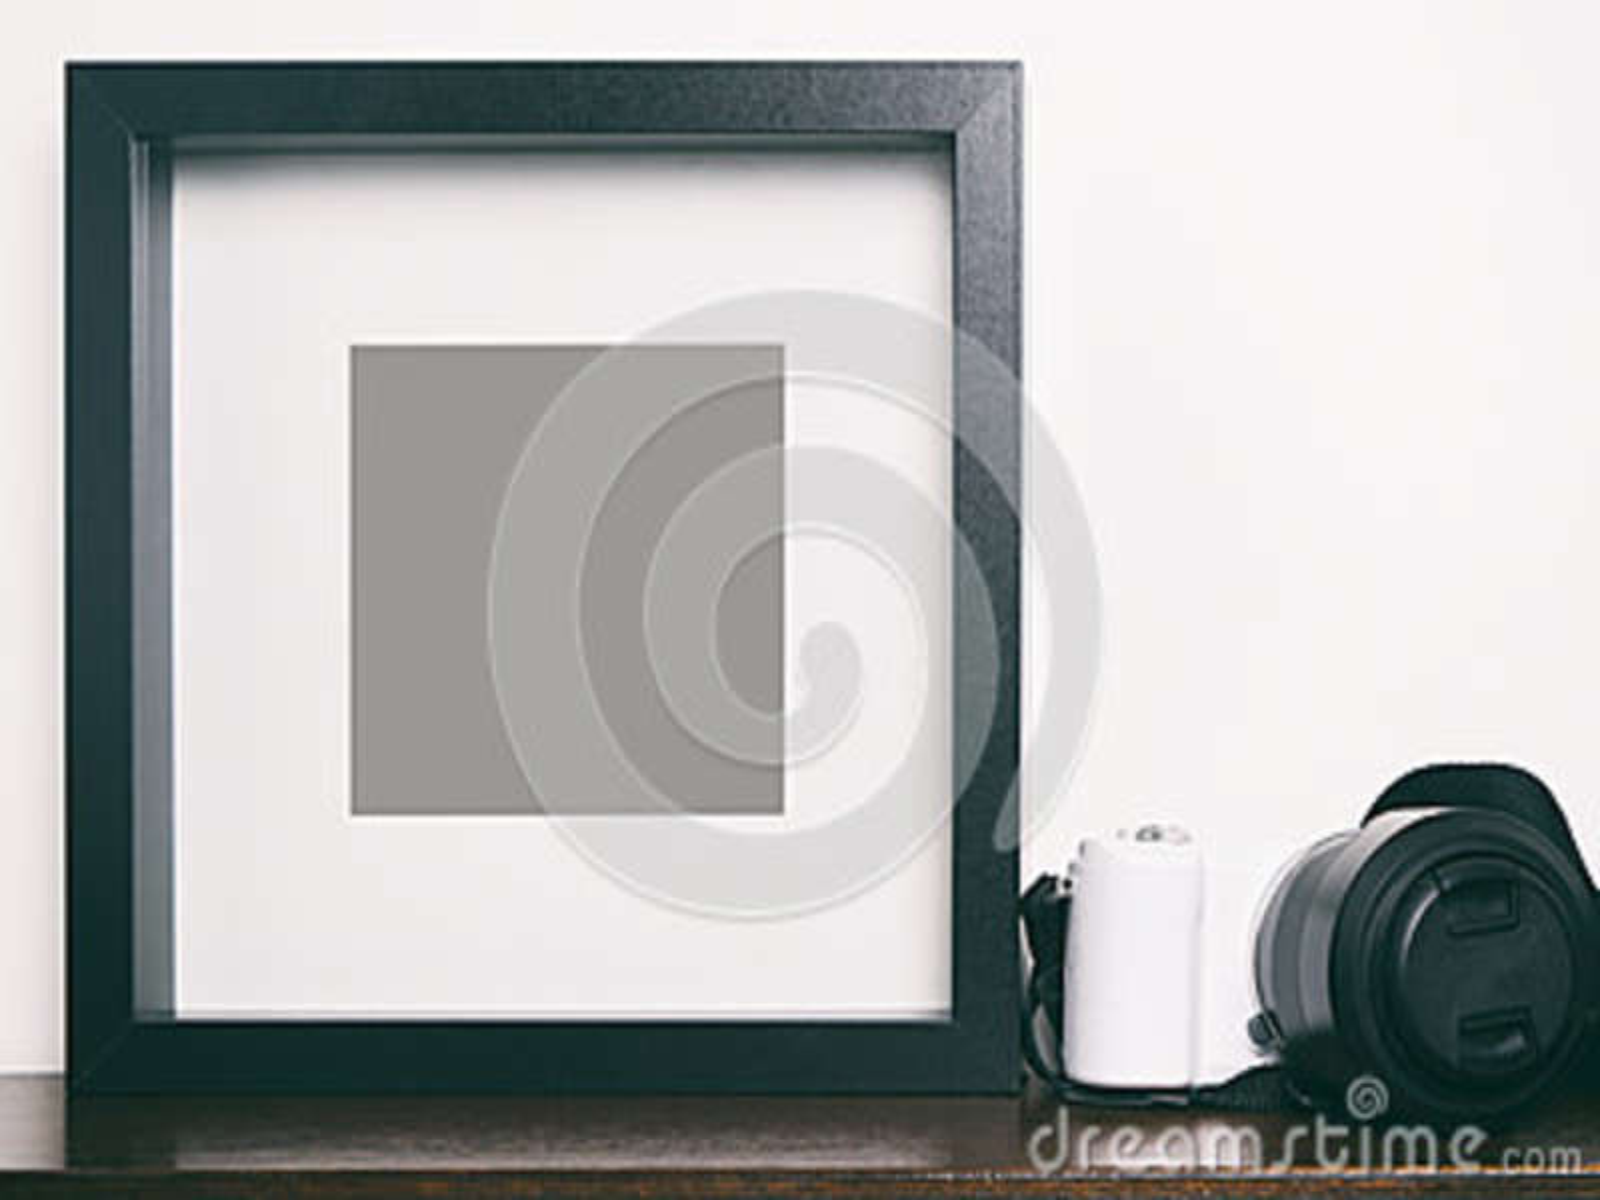 Thick blank black photo frame on shelf with camera